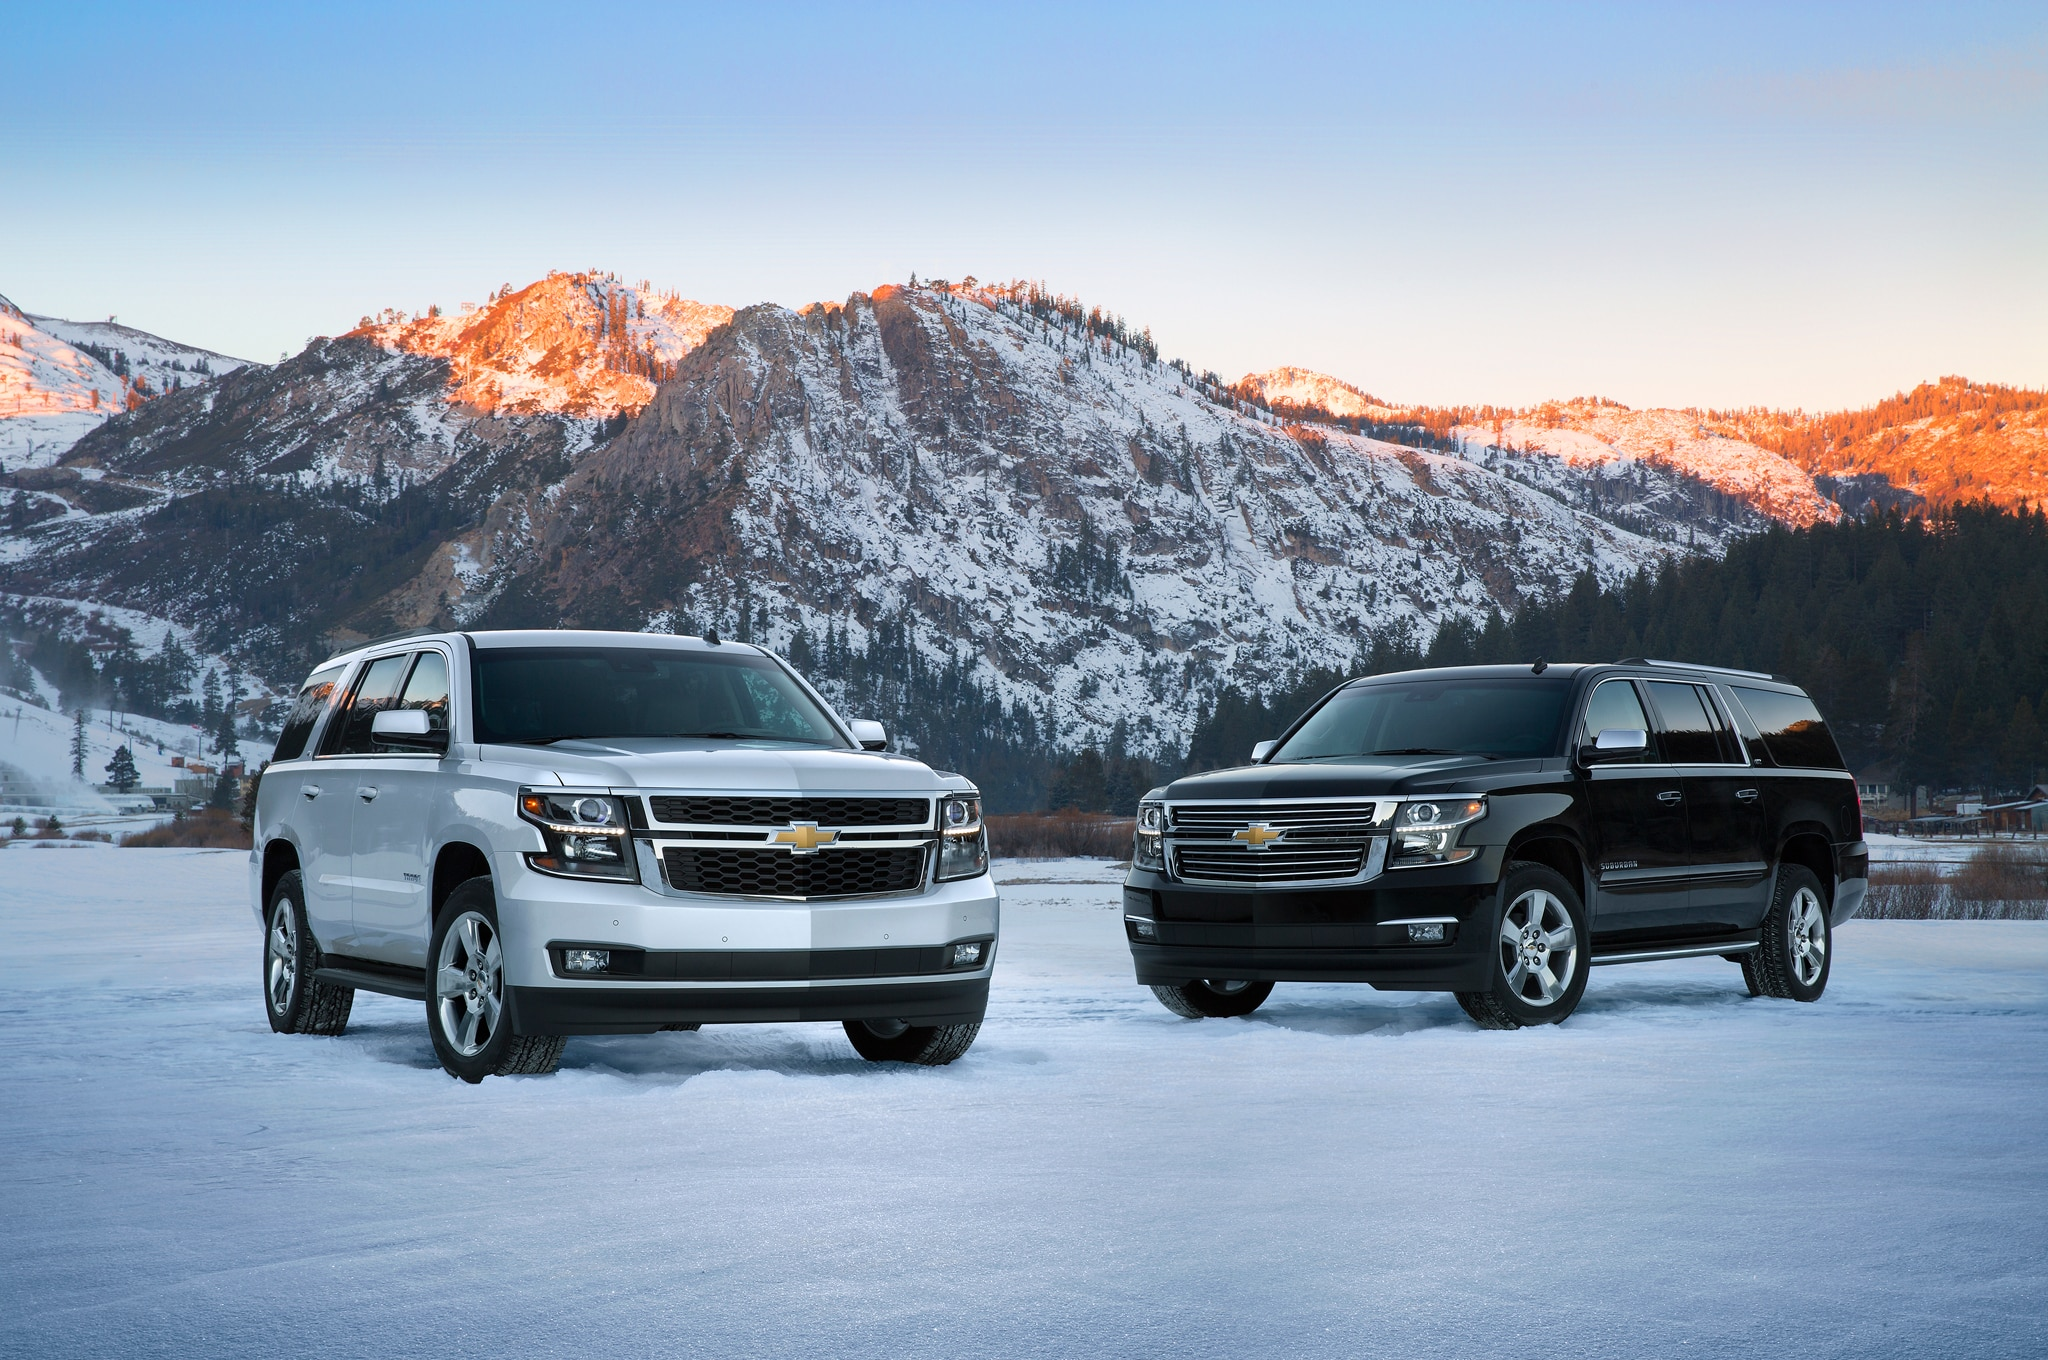 2015 Chevrolet Suburban Chevrolet Tahoe Front Three Quarters1